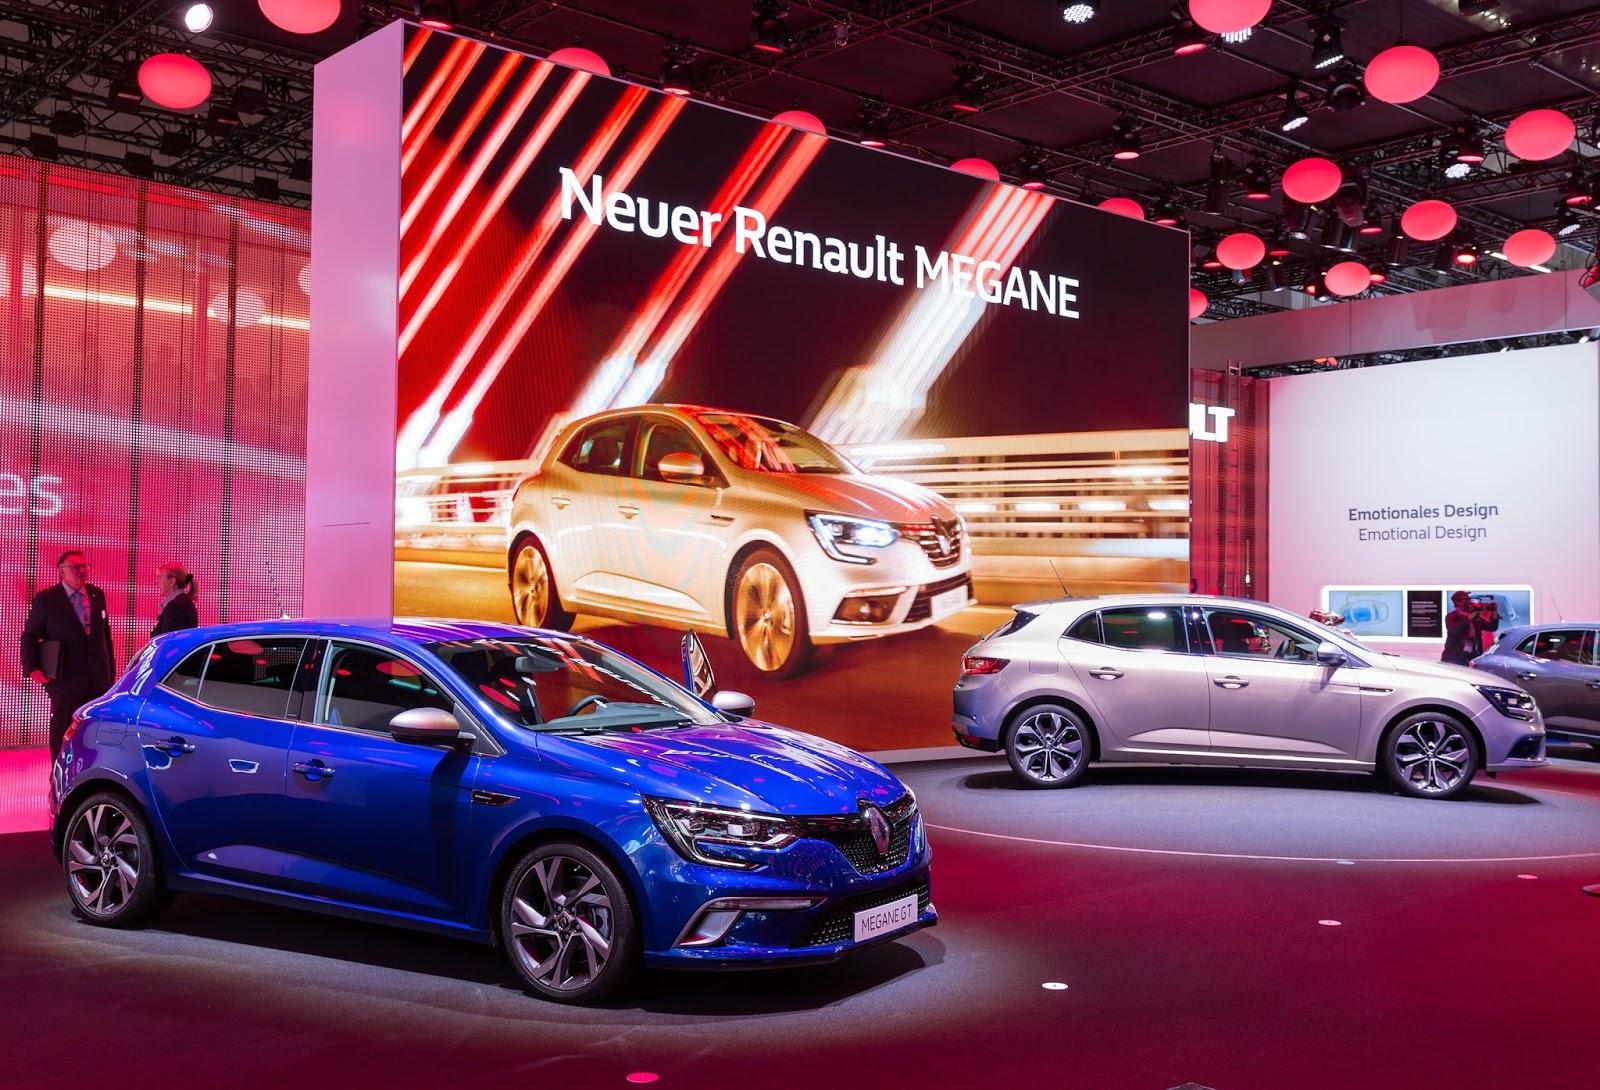 %25CE%259D%25CE%25AD%25CE%25BF Renault MEGANE%2526MEGANE GT Το νέο Renault Mégane παρουσιάστηκε στην διεθνή έκθεση της Φρανκφούρτης με έκδοση GT και 205 ίππους Renault, Renault Megane, Renault Talisman, Renault Talisman Estate, ΣΑΛΟΝΙ ΑΥΤΟΚΙΝΗΤΟΥΦΡΑΝΚΦΟΥΡΤΗΣ 2015